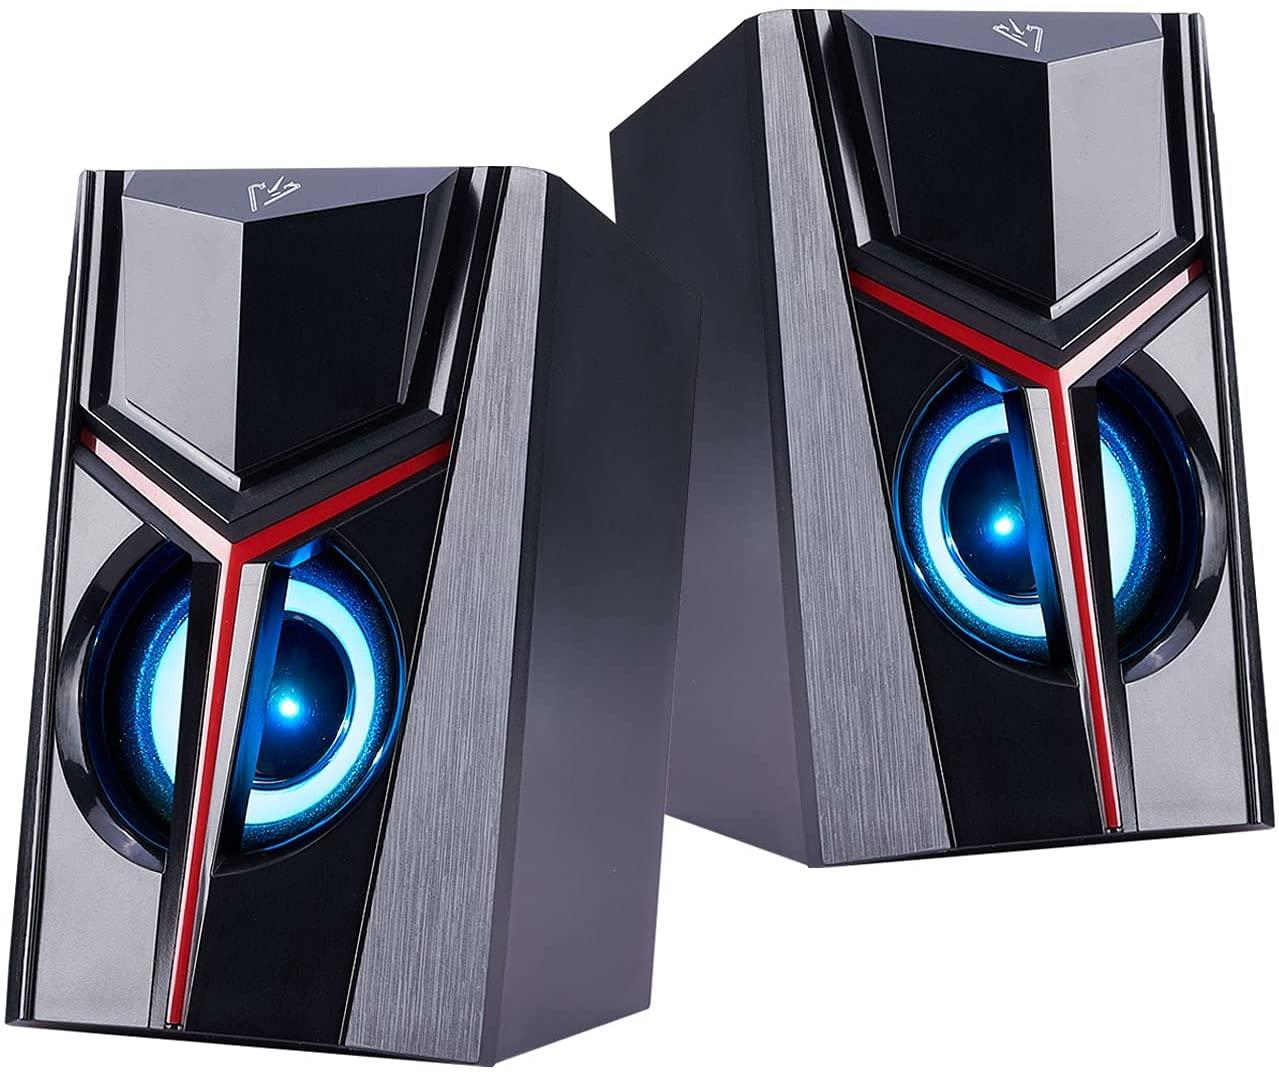 COOSEON - Bocinas para computadora con iluminación (cupón de 10% de descuento disponible)